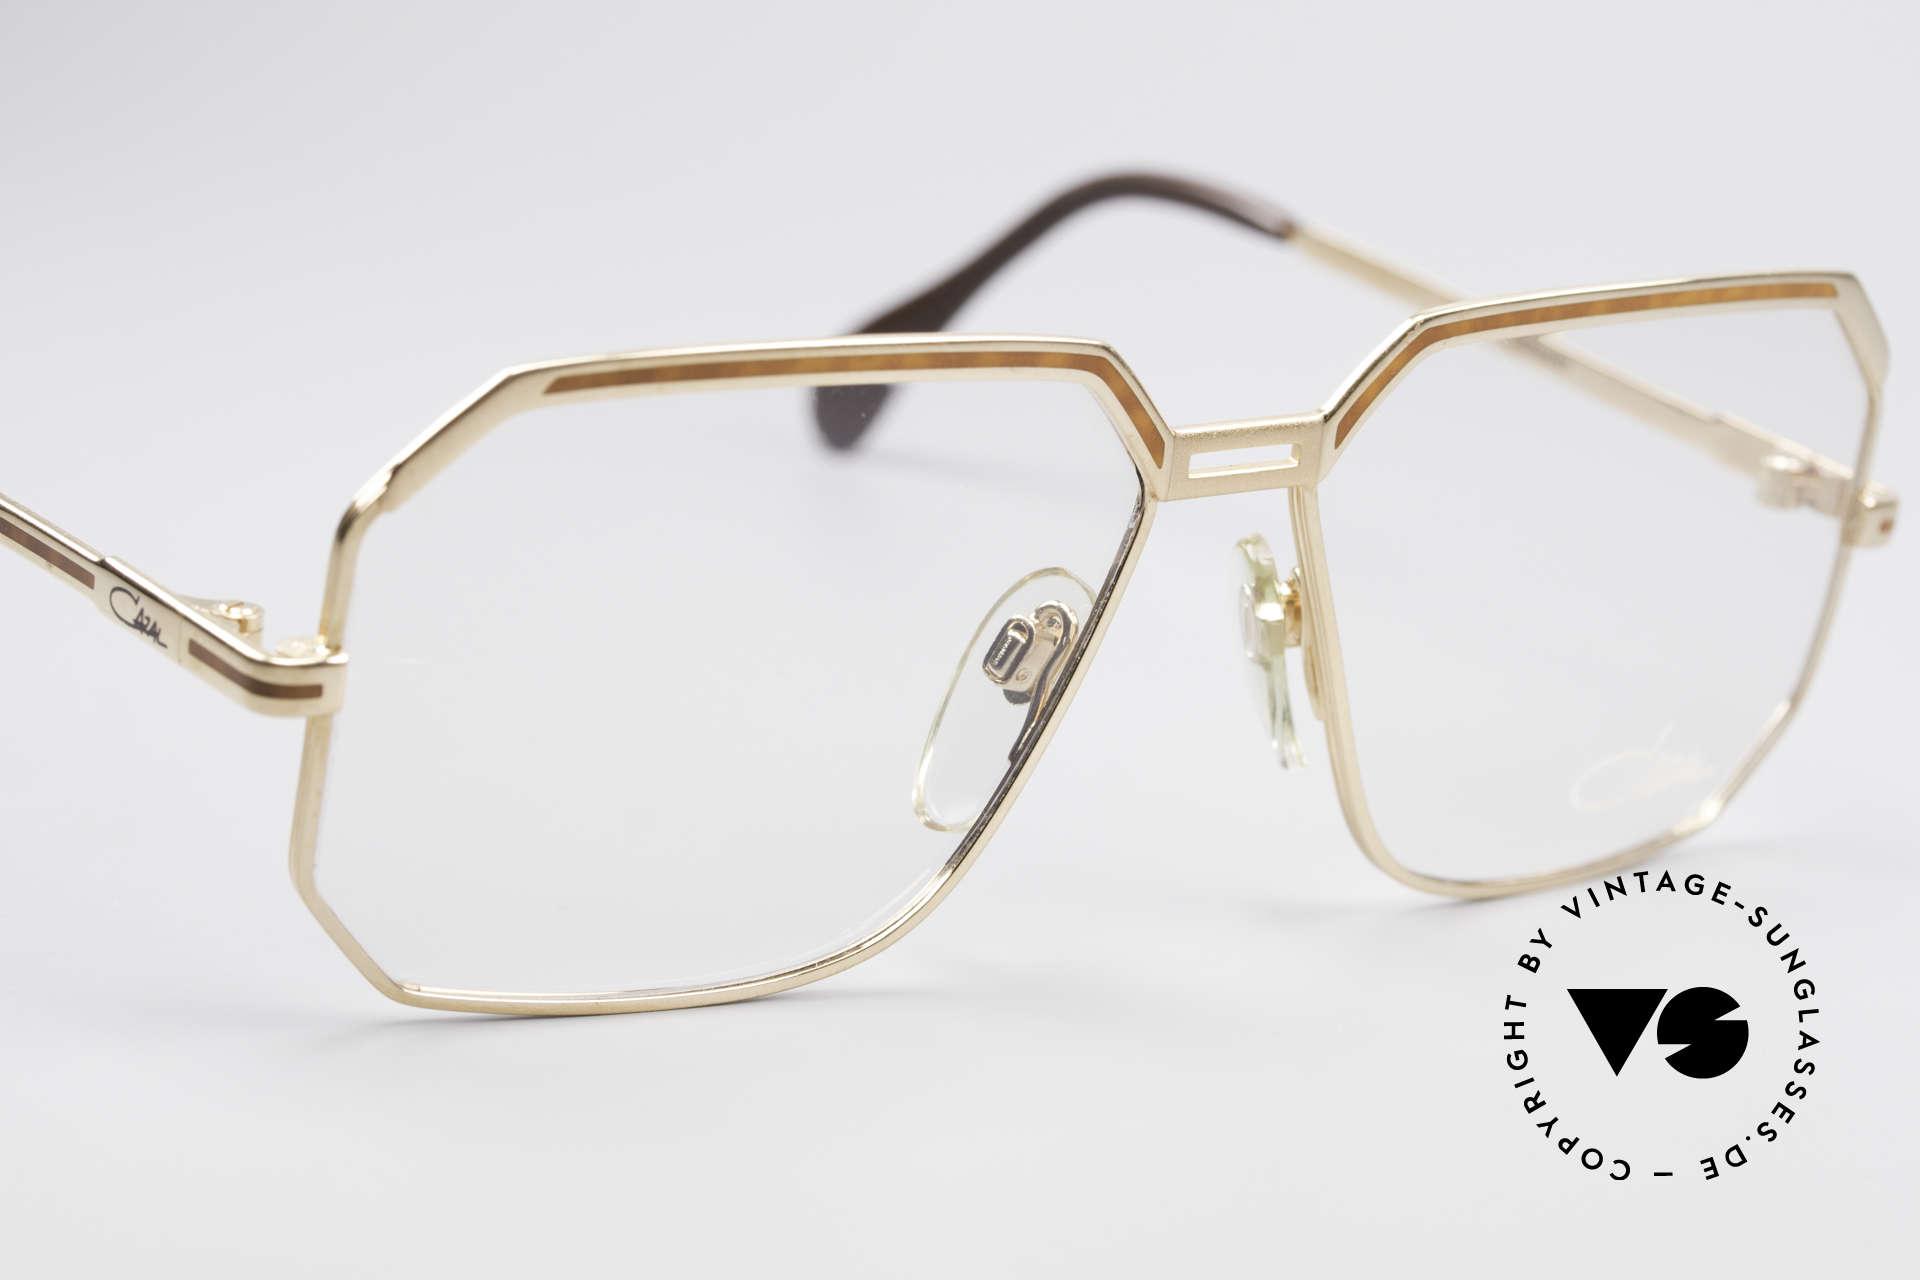 Cazal 727 Michail Gorbatschow Glasses, NO RETRO EYEWEAR, but a true old rarity, Made for Men